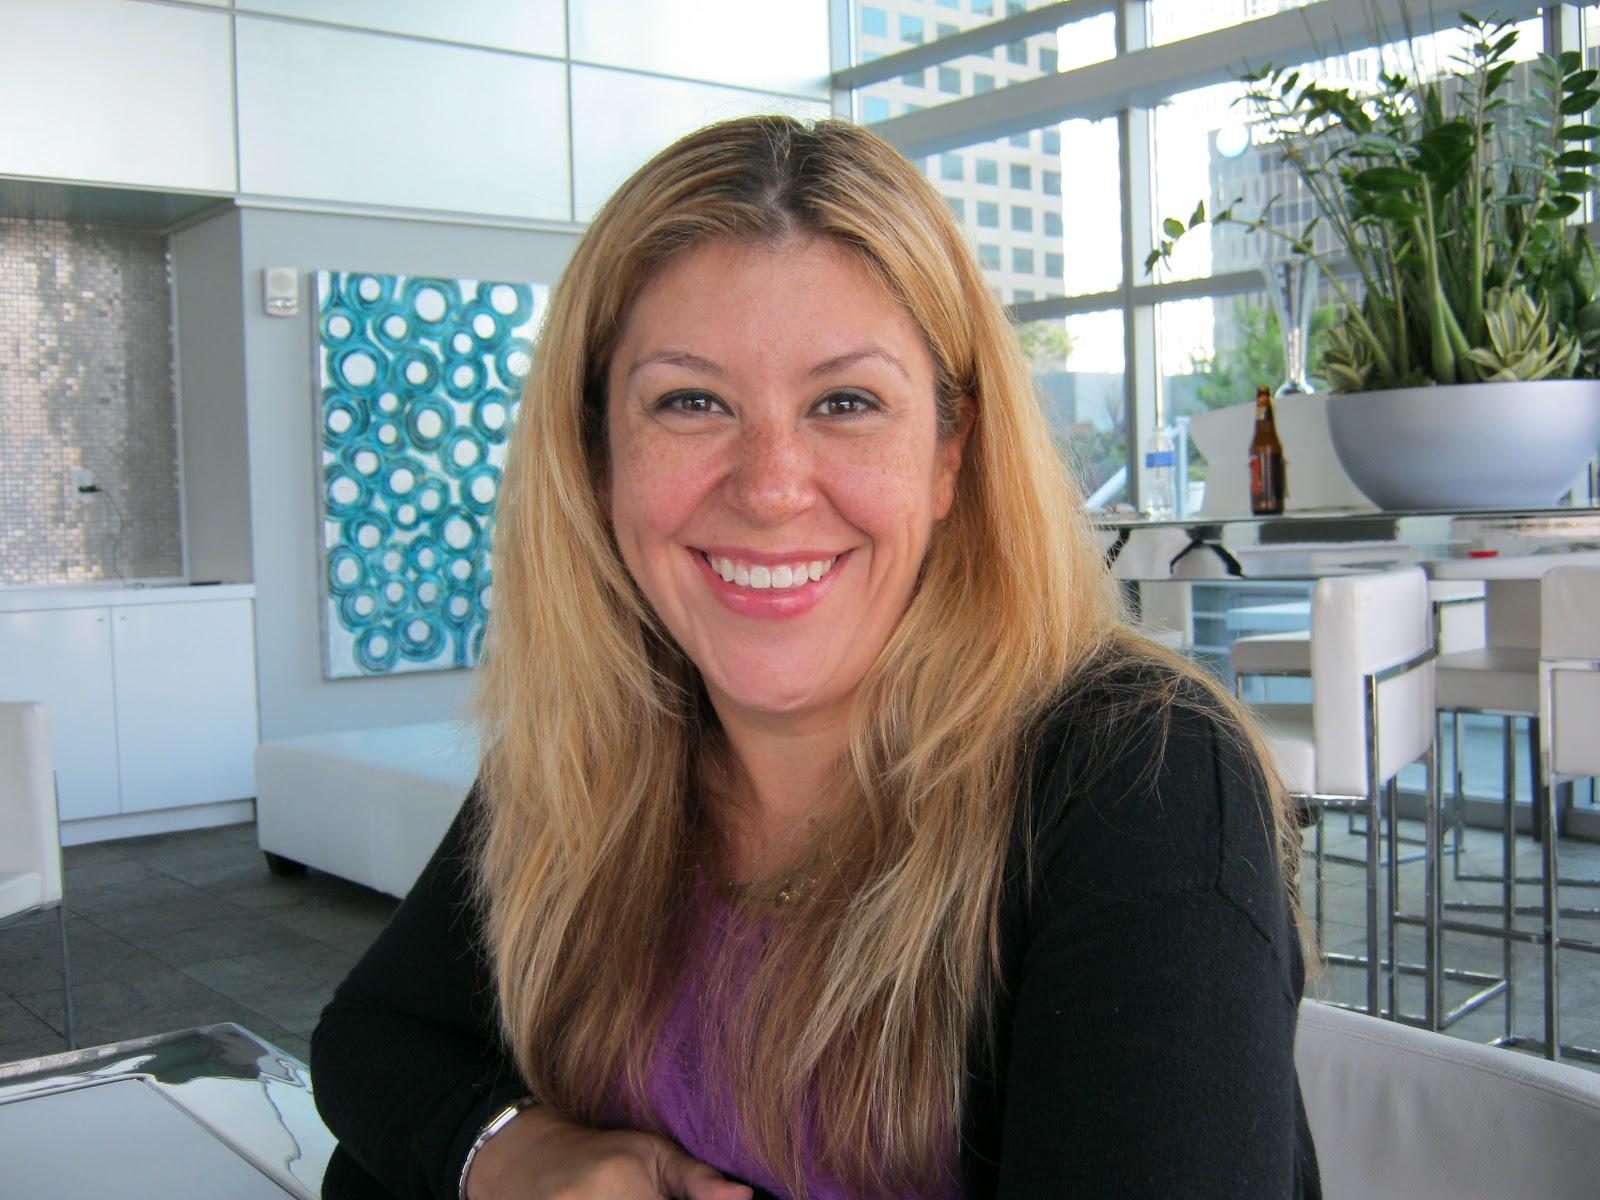 Mutya Orquia (b. 2006),Claudine Barretto (b. 1979) Erotic video Jolene Anderson born May 26, 1980 (age 38),Stephanie James